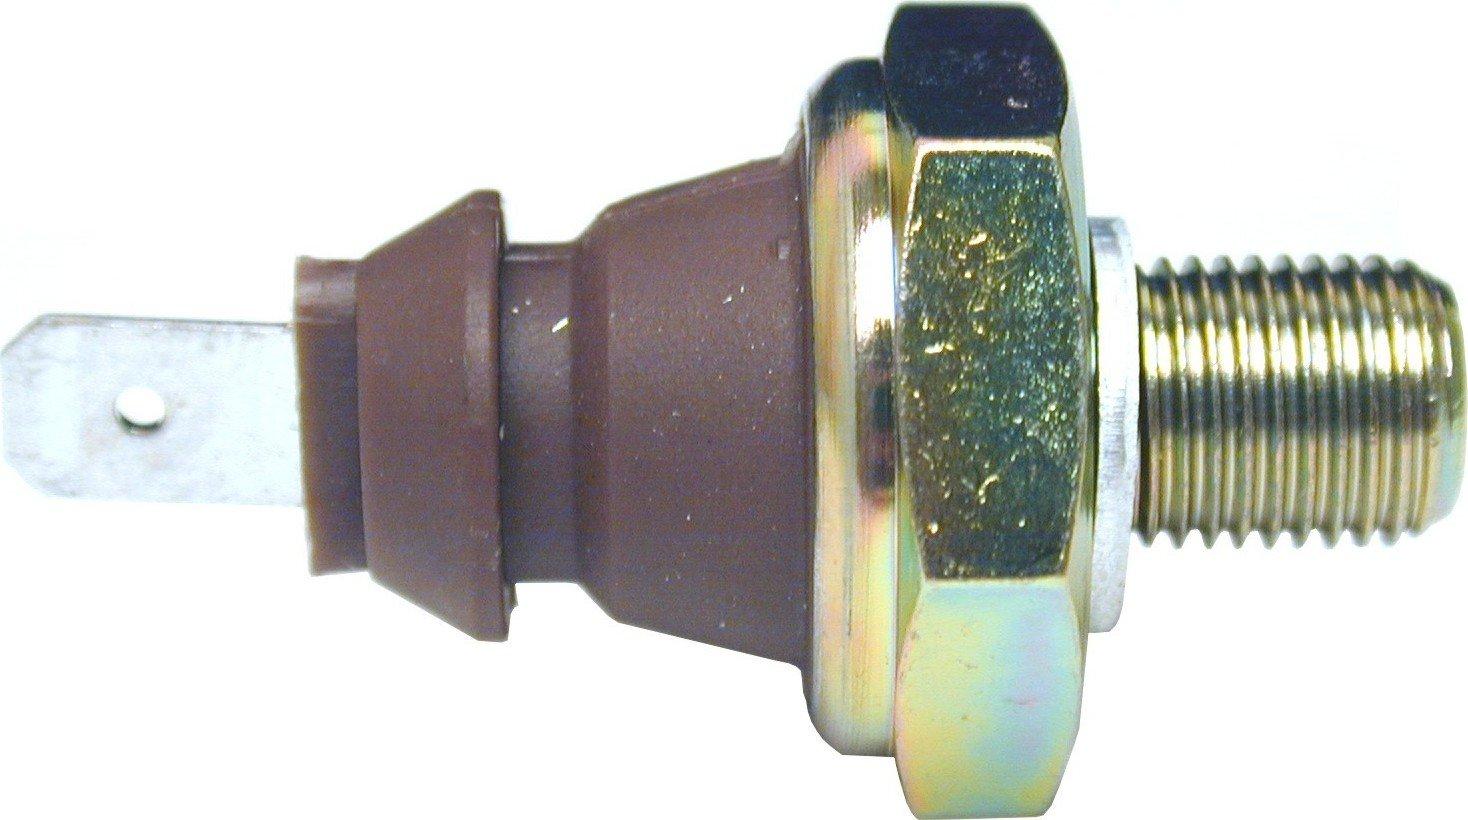 01-03 bar URO Parts 91160623000 Oil Pressure Switch